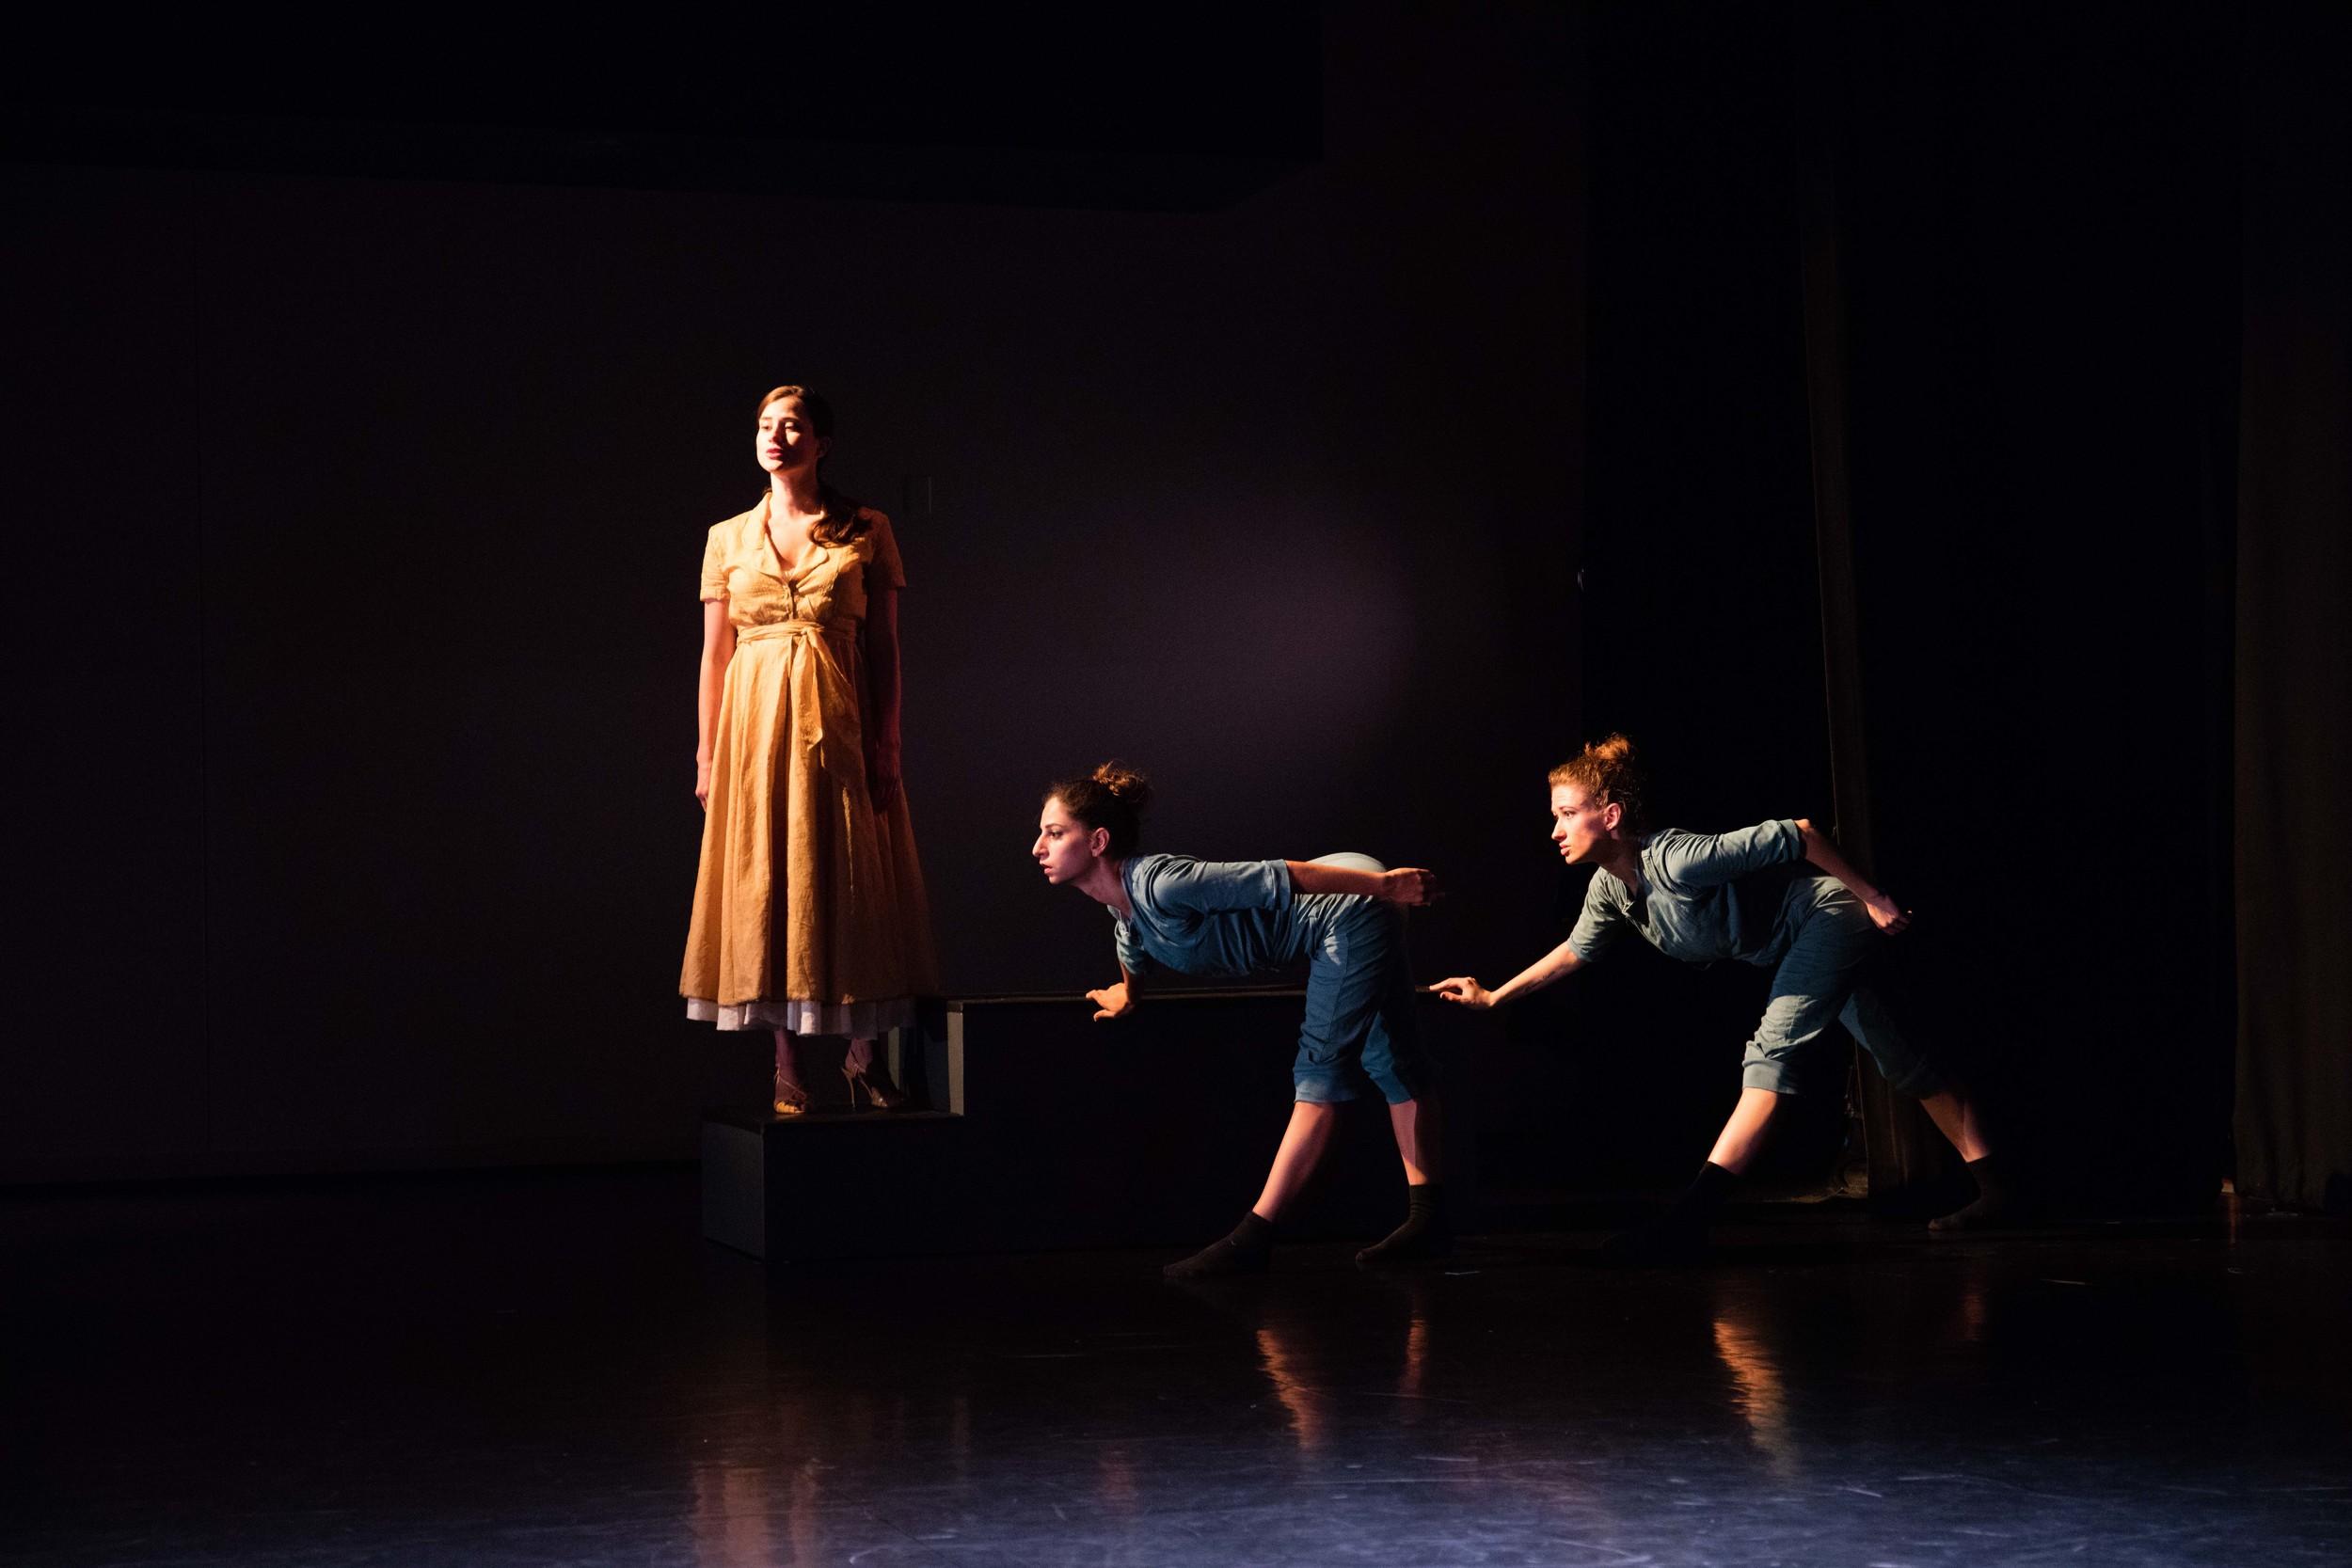 From the left: Anna Ward, Magdalena Gyftopoulos, and Nina Brindamour/photo by Daniel J. van Ackere